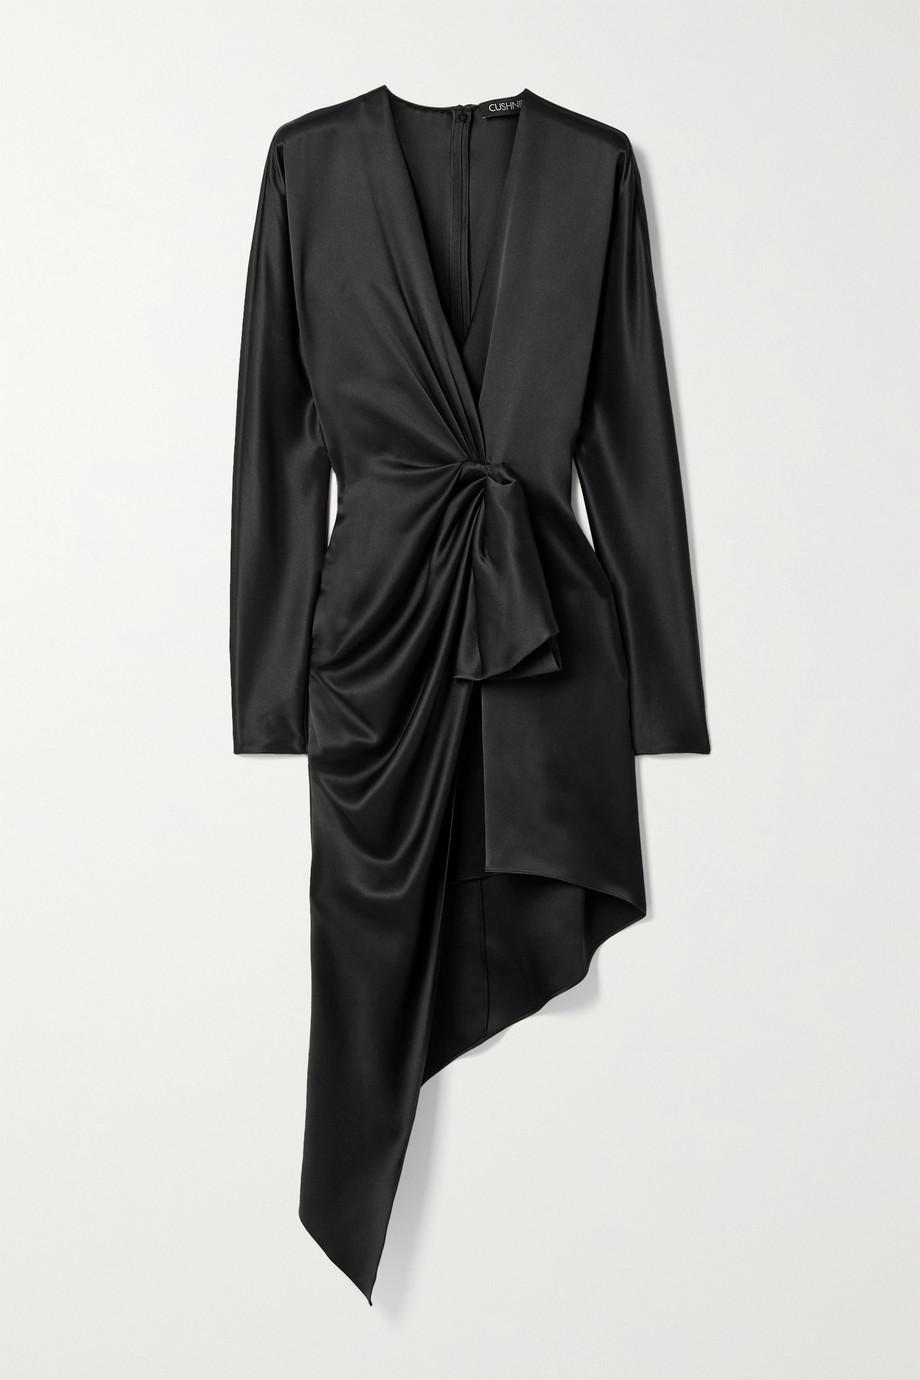 Cushnie Asymmetric twist-front silk-satin dress